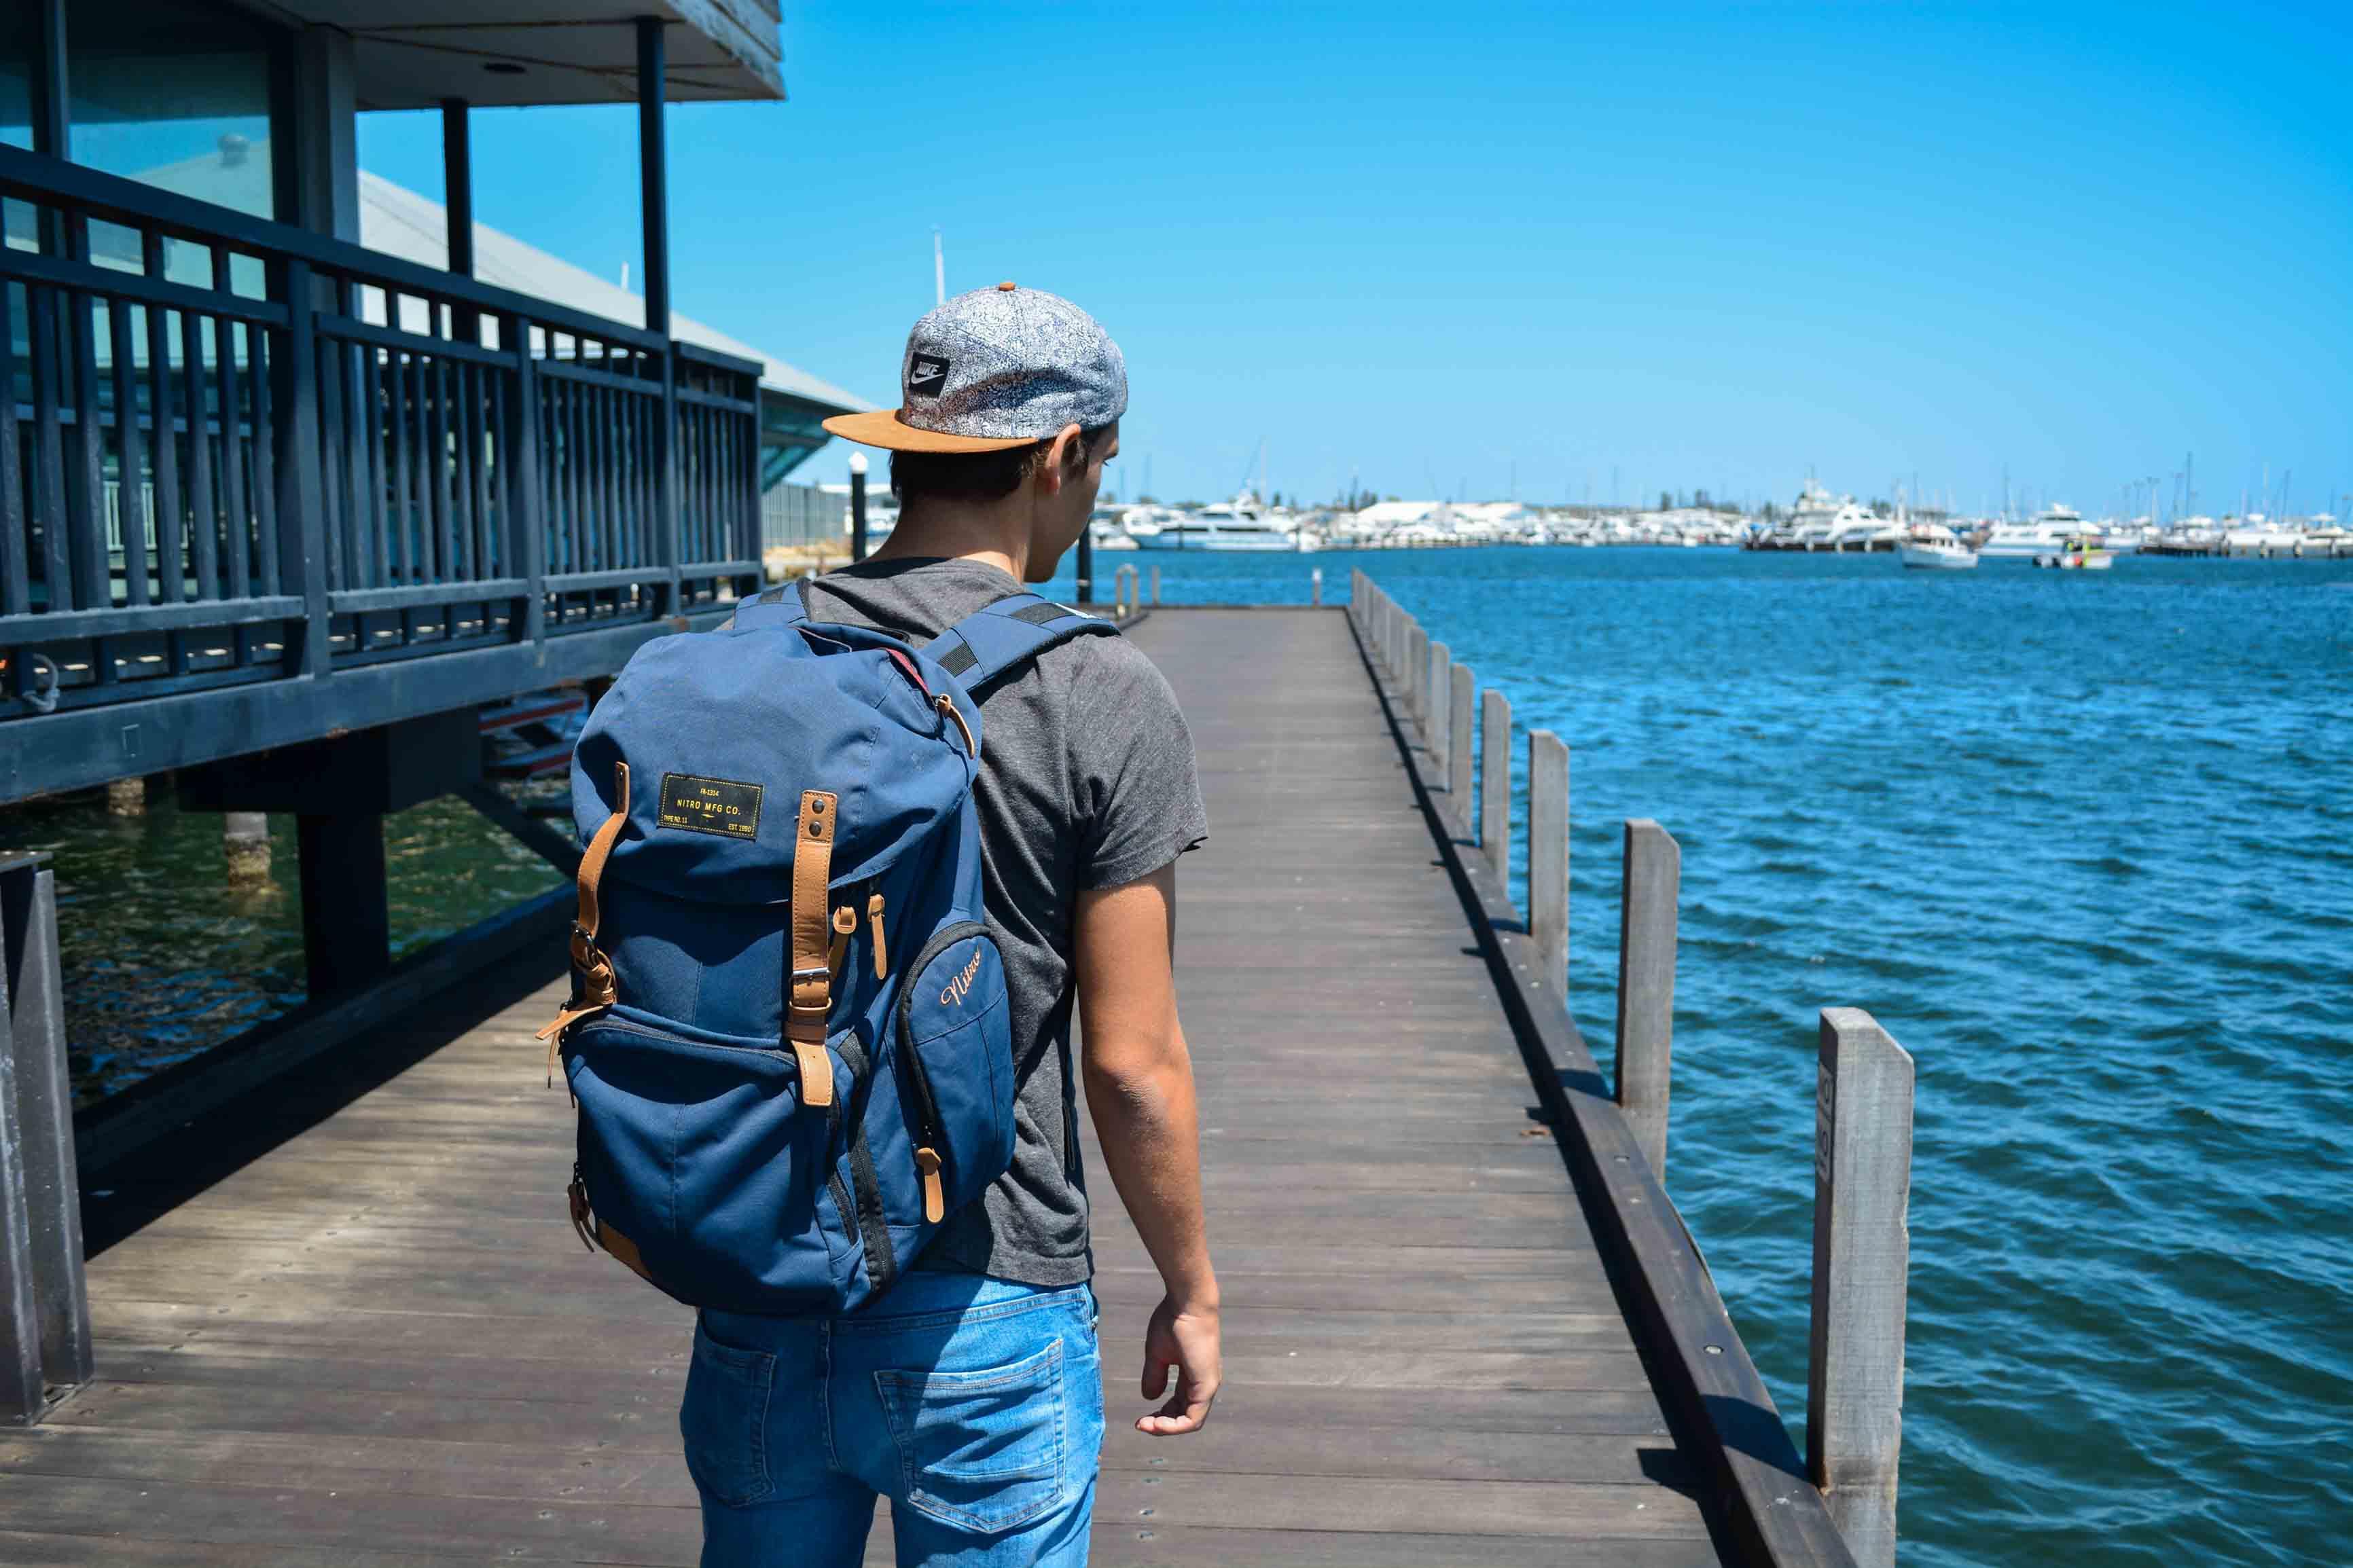 Adri in Fremantle